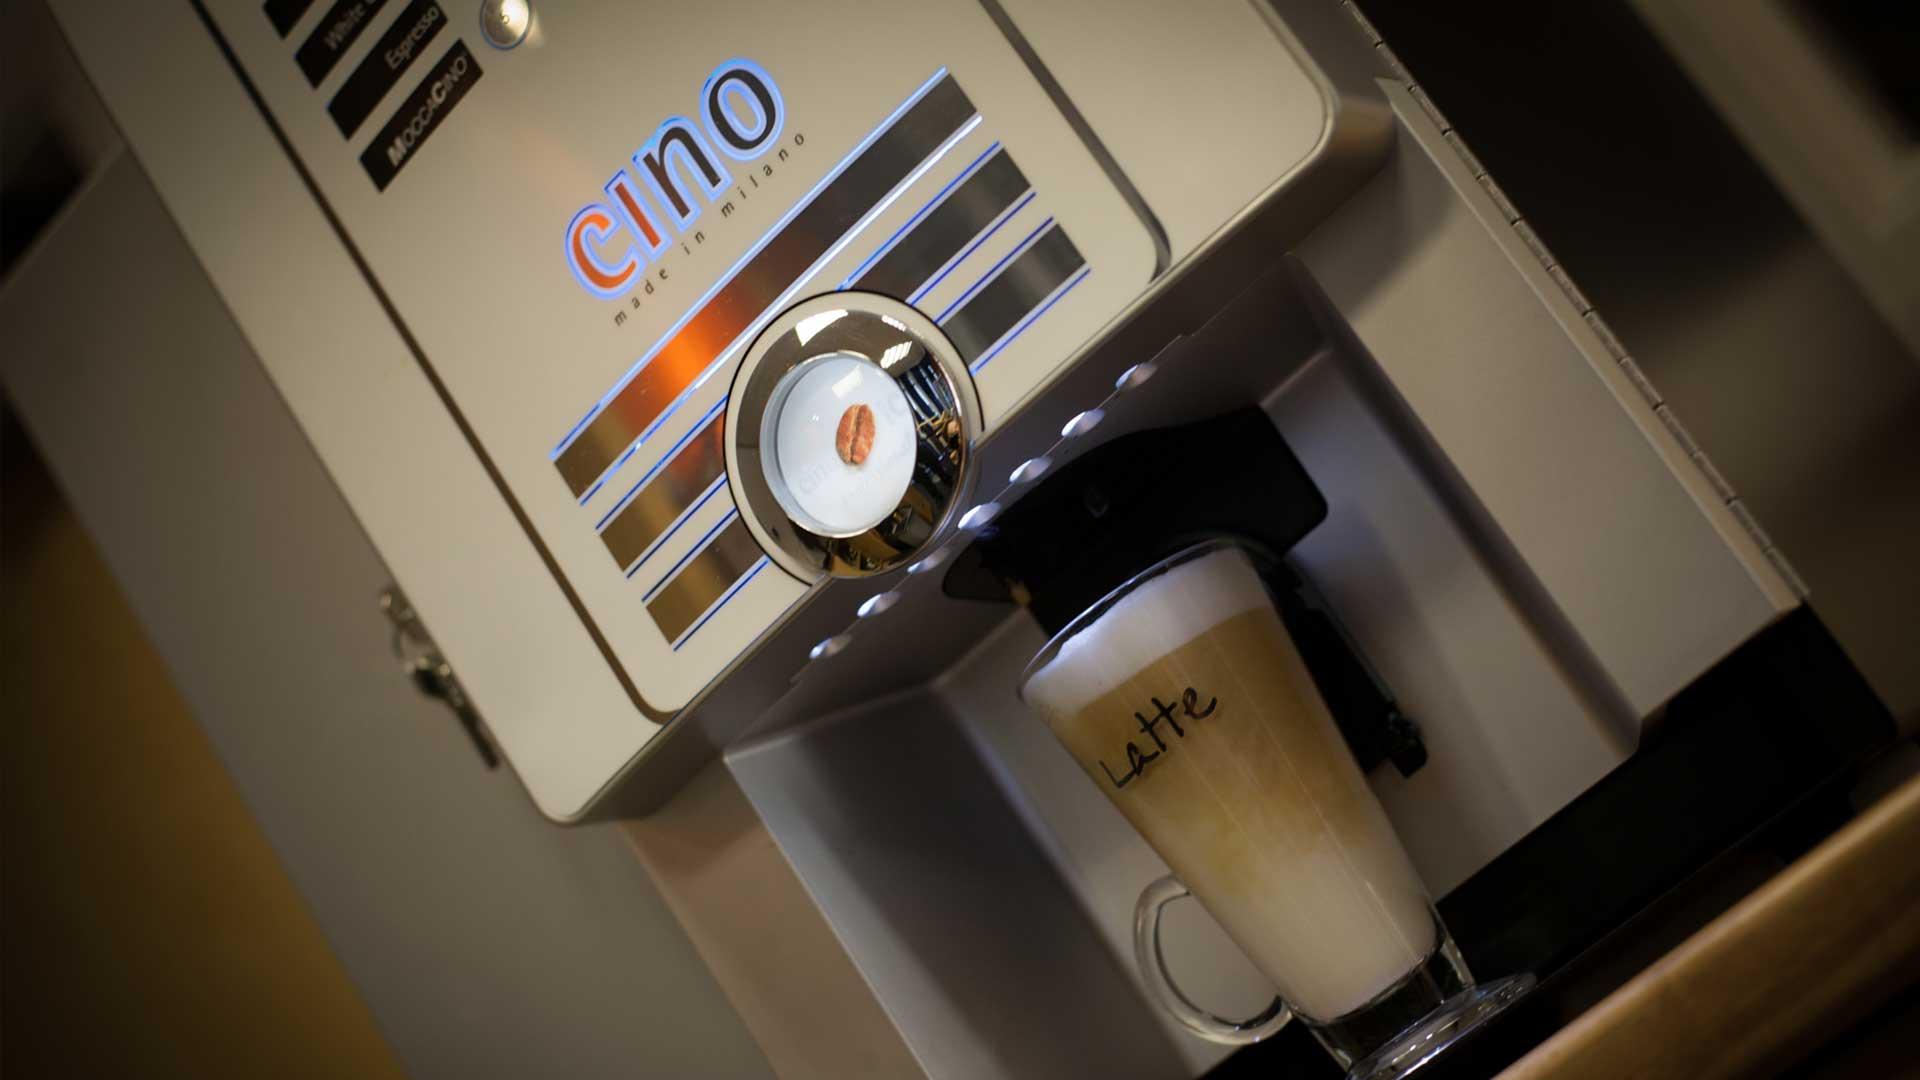 Cino Ec Espresso Coffee Machine Vending Machines Snack Machines Coffee Machines Water